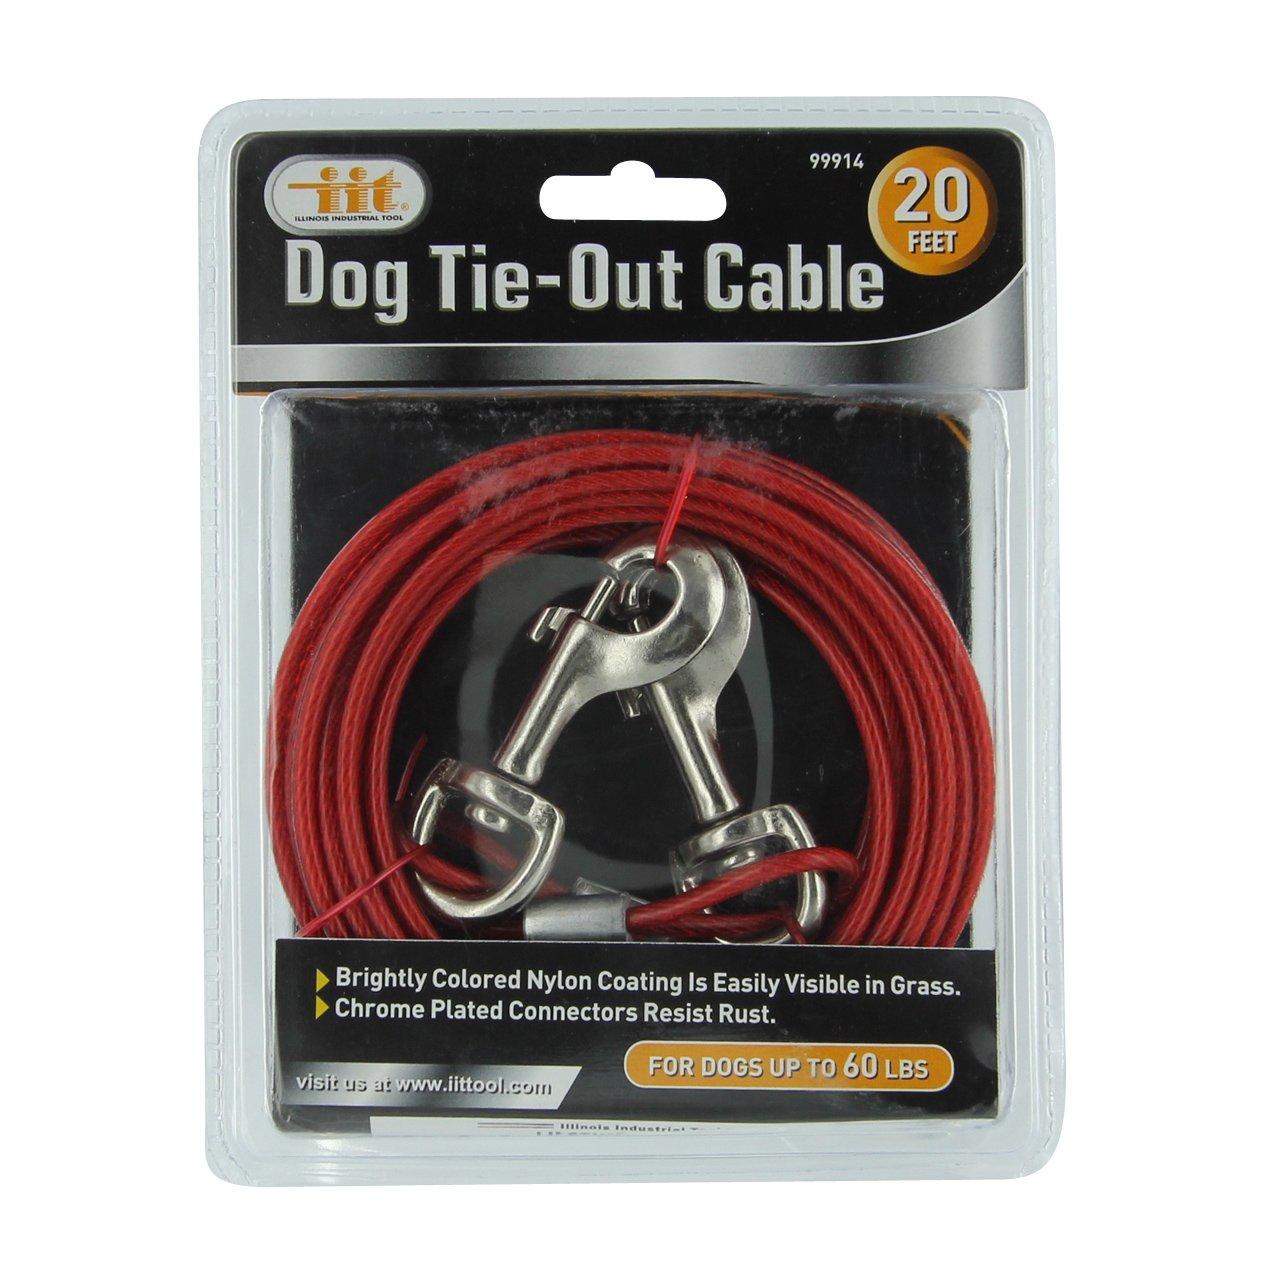 amazon com iit 99914 dog tie out cable 20 feet iit pet tie